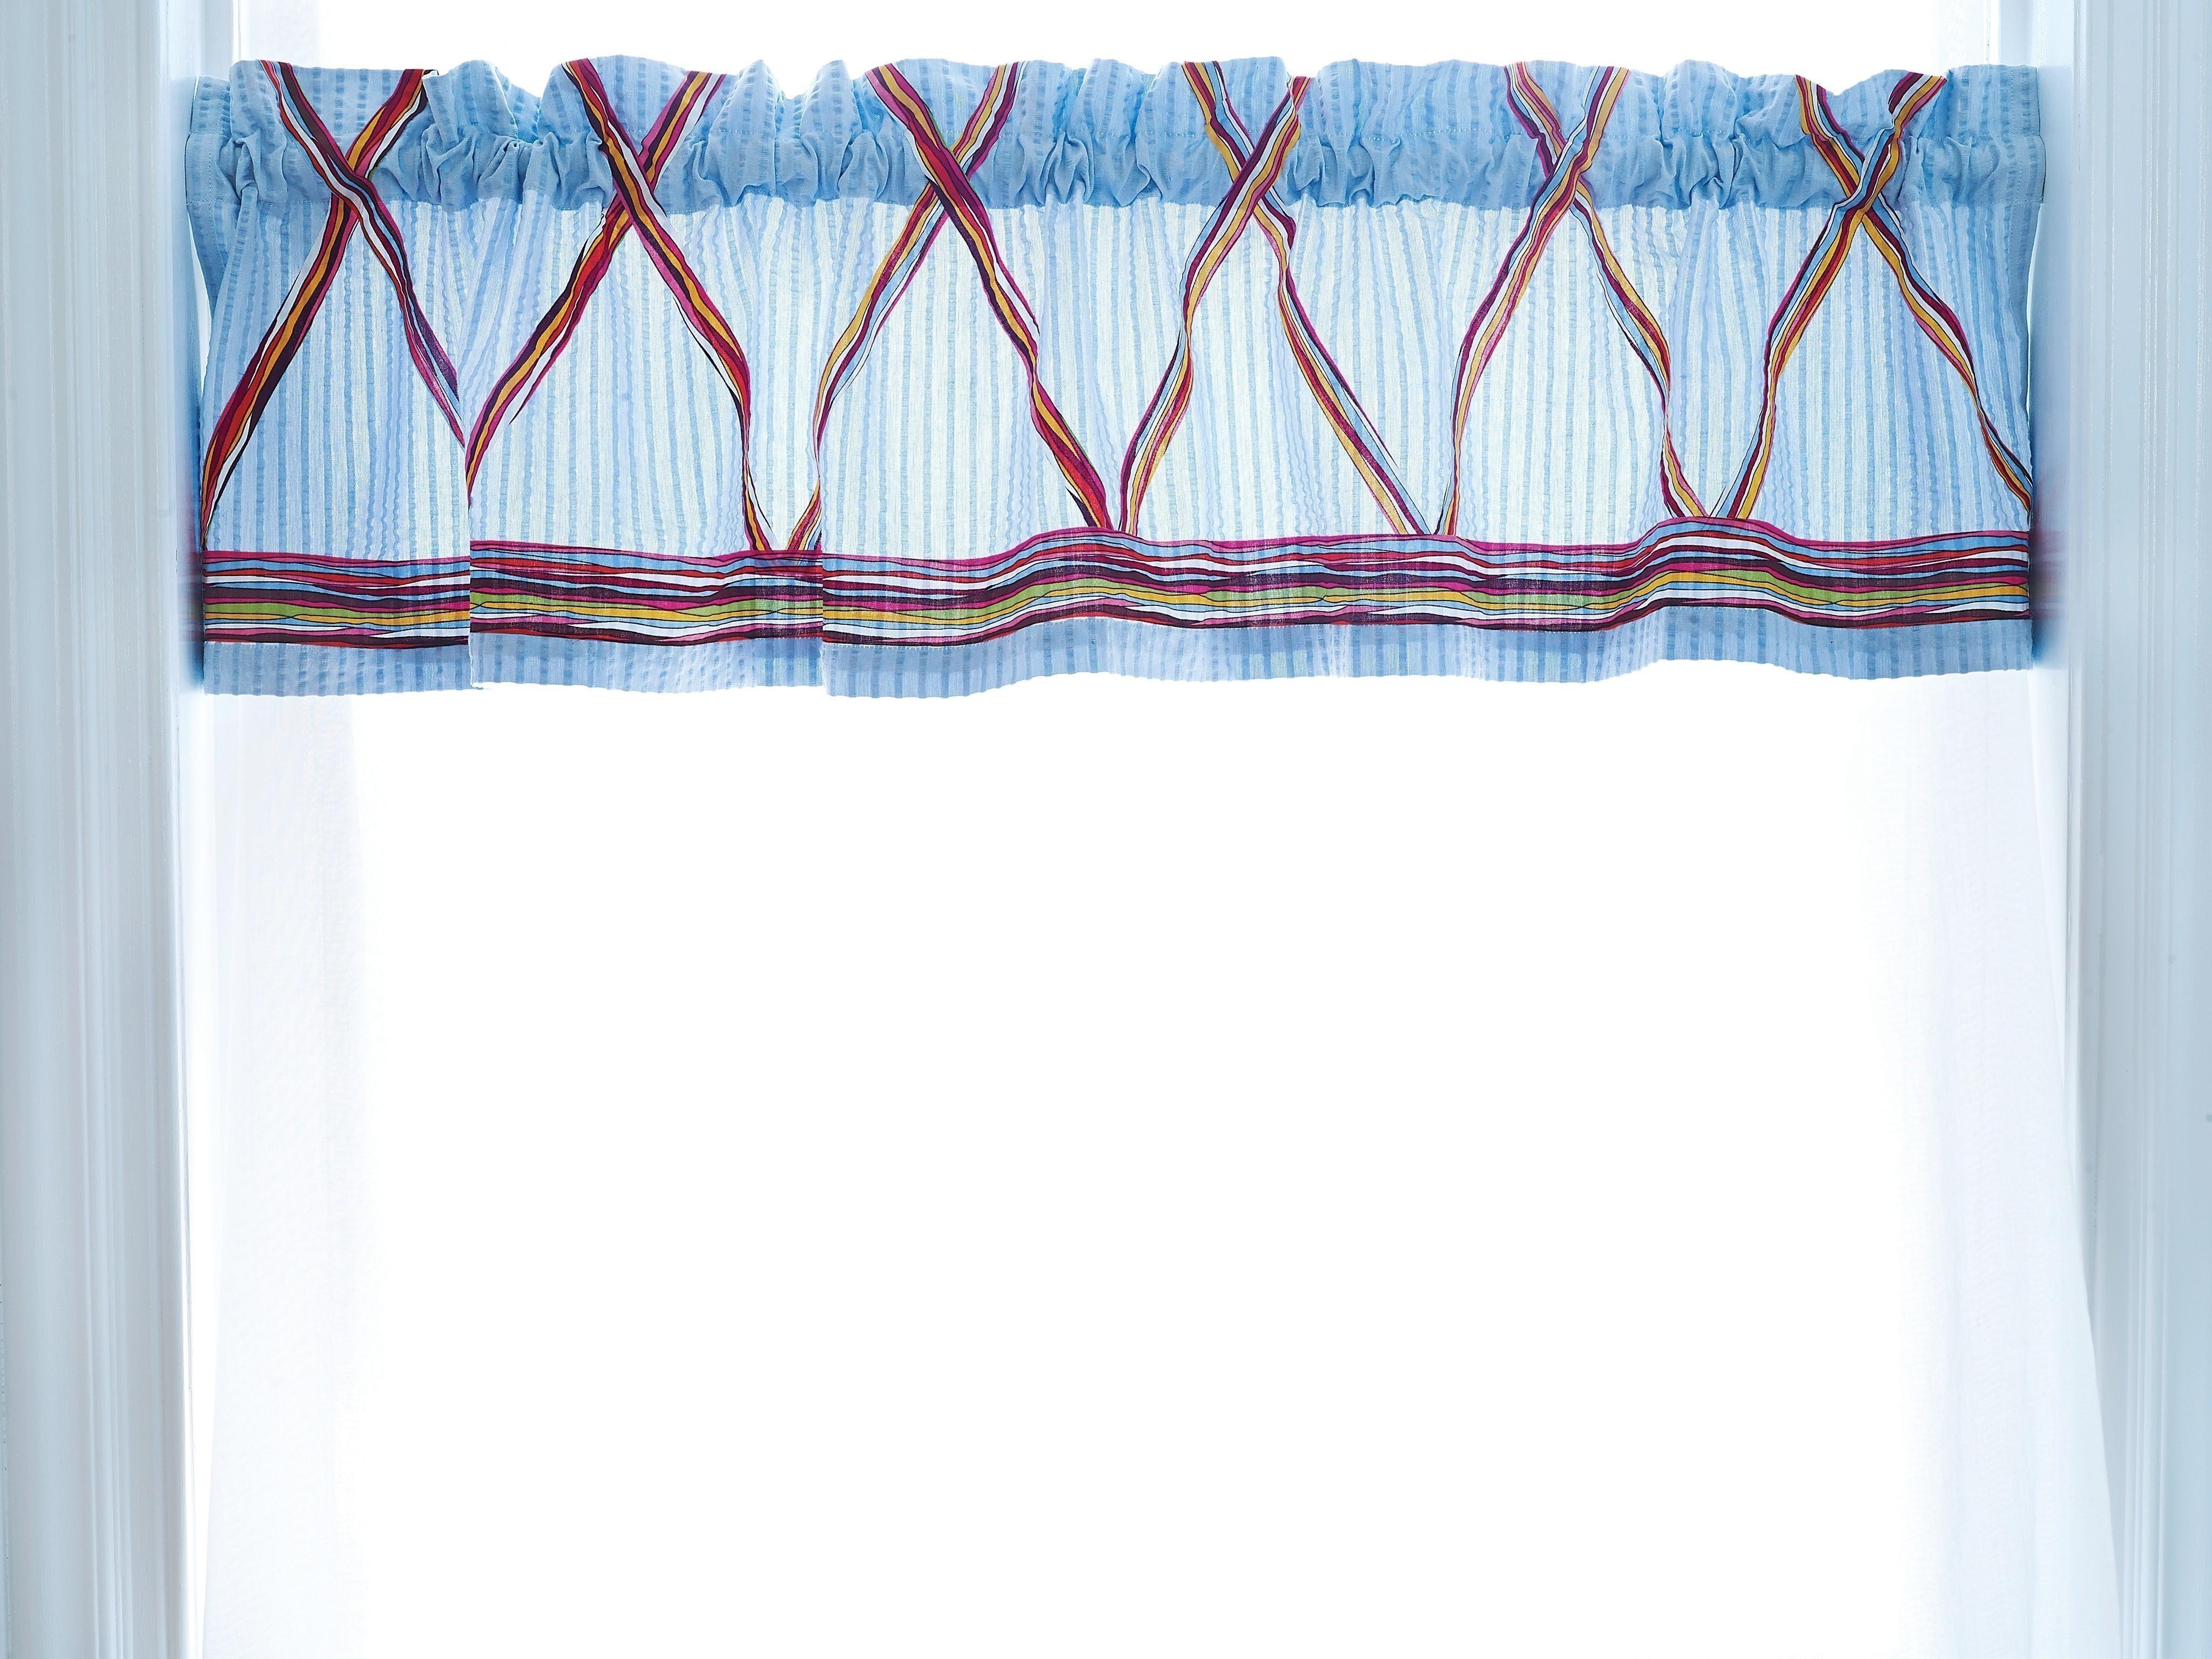 made of tiebacks pencil pair dreamscene itm blackout pleat tape ready curtain curtains door thermal